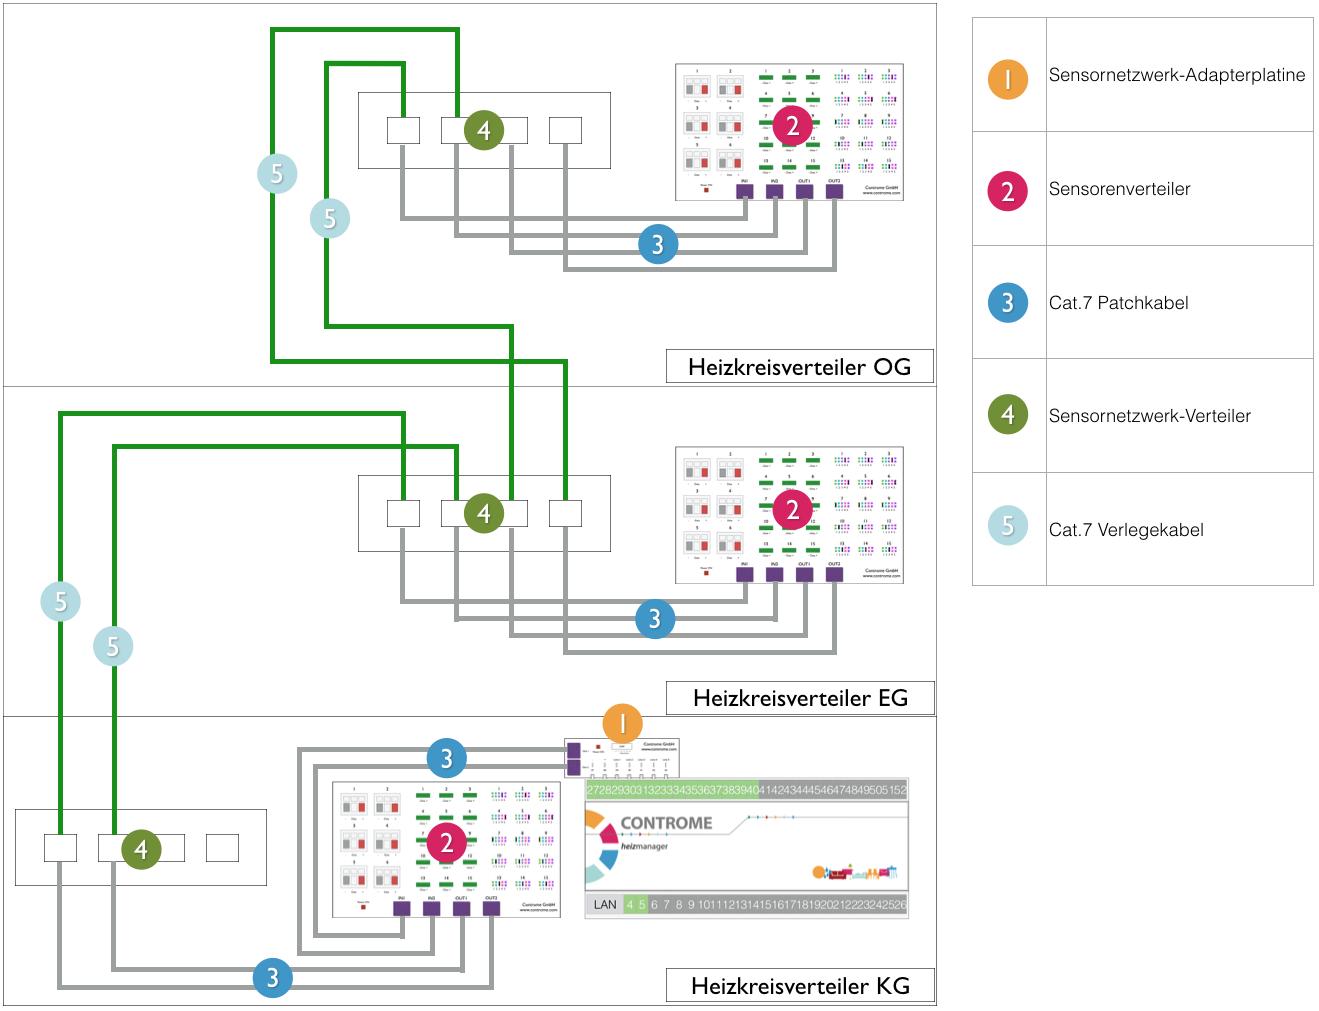 Inbetriebnahme Sensoren – Controme Support Center